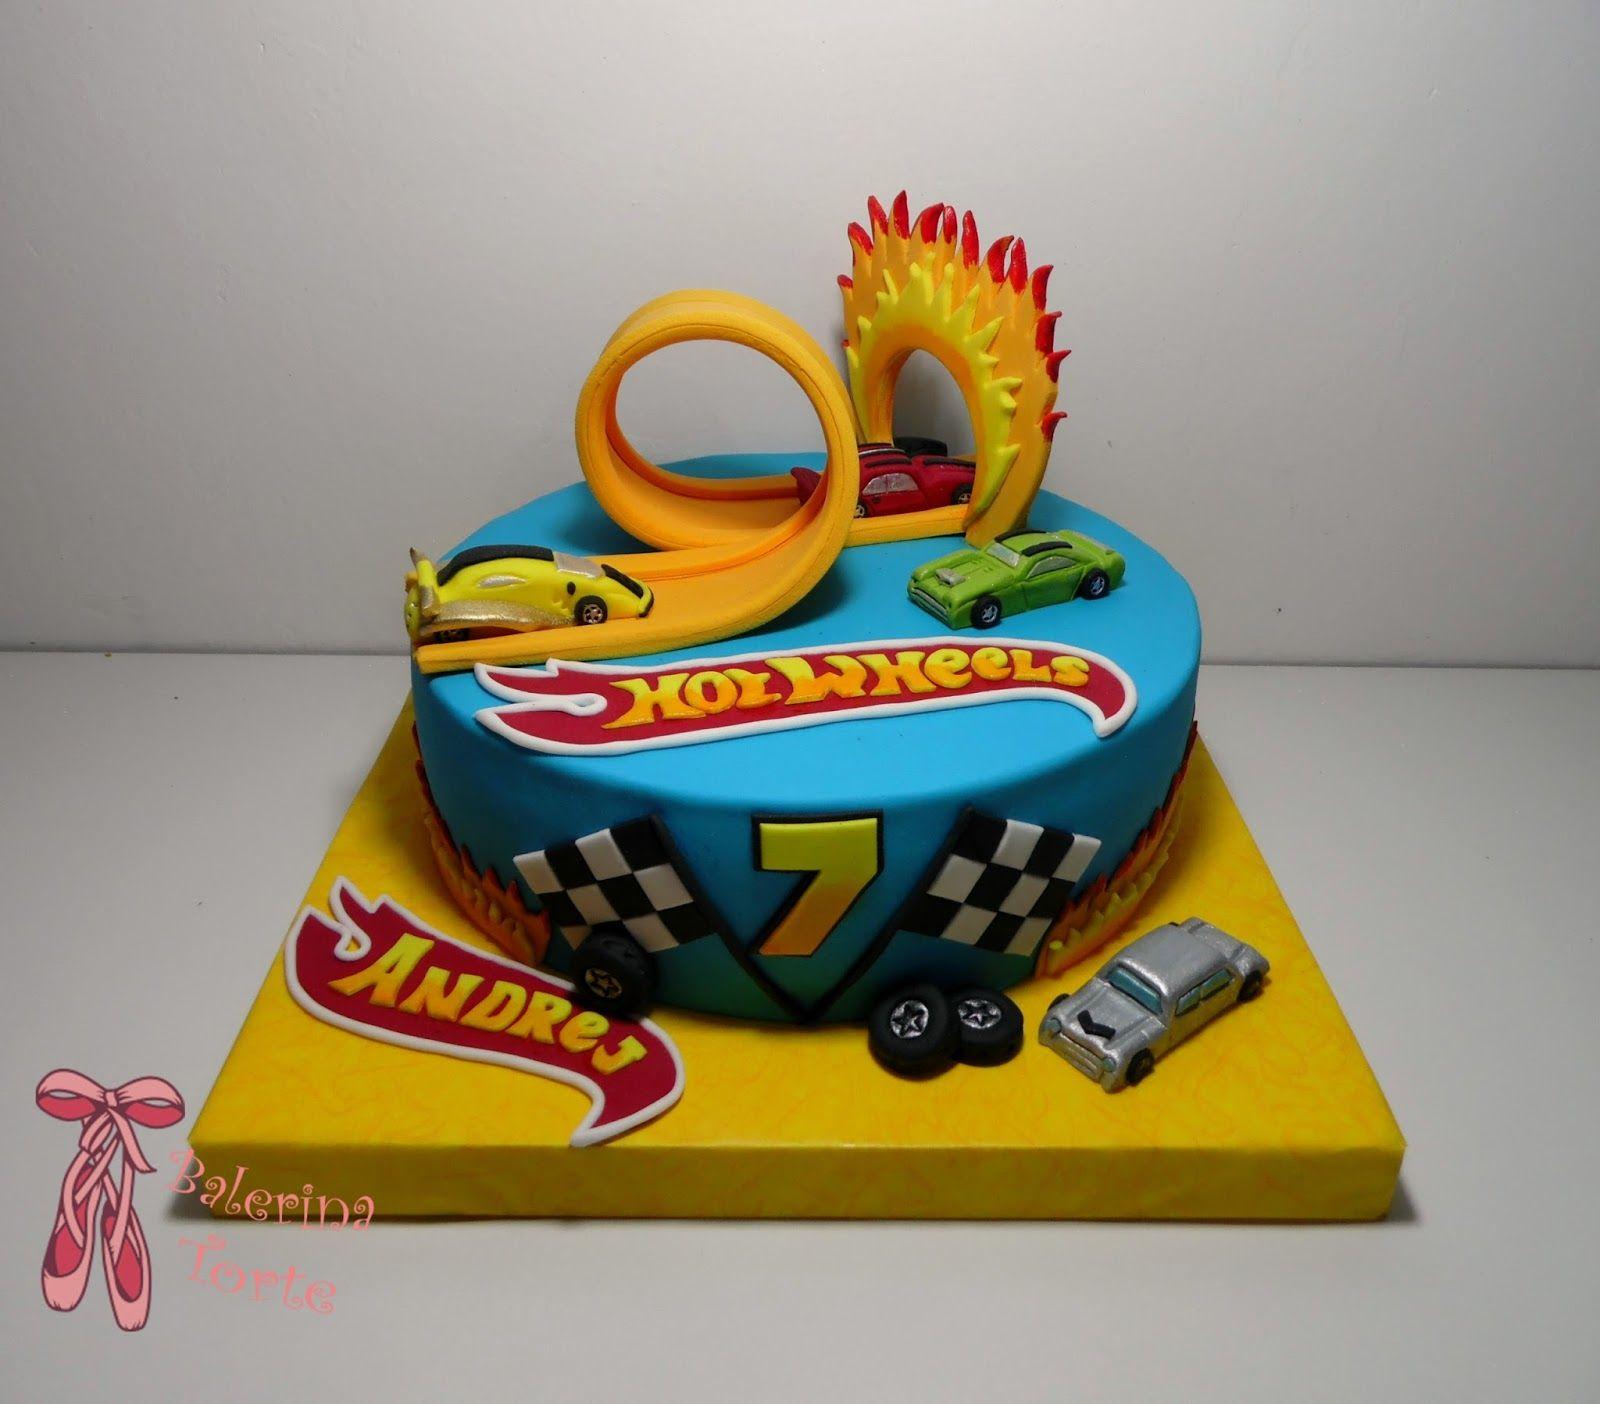 Awe Inspiring Hotwheels Cake Hotwheels Torta By Balerina Jagodina With Images Funny Birthday Cards Online Alyptdamsfinfo